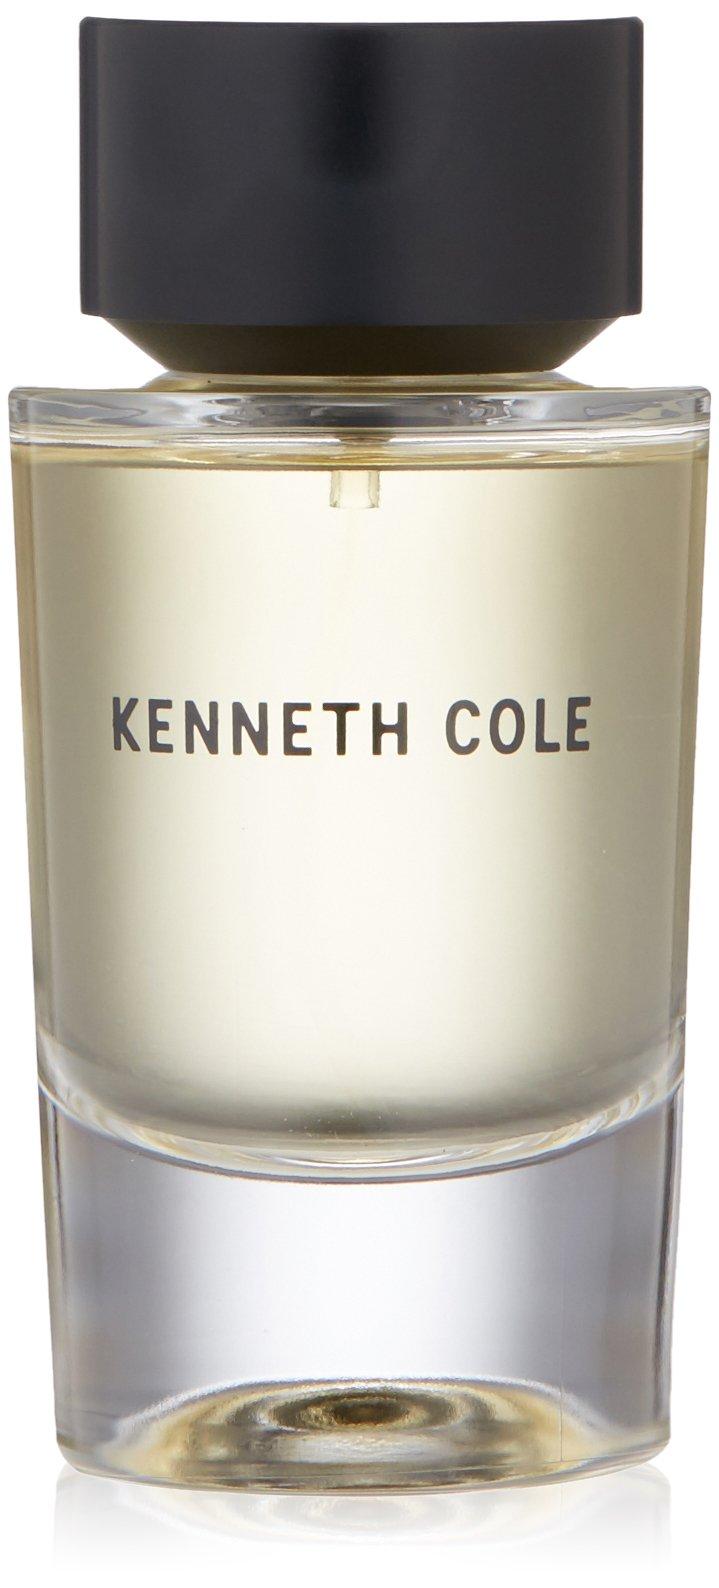 Kenneth Cole Eau de Parfum Spray For Her, 1.7 oz.